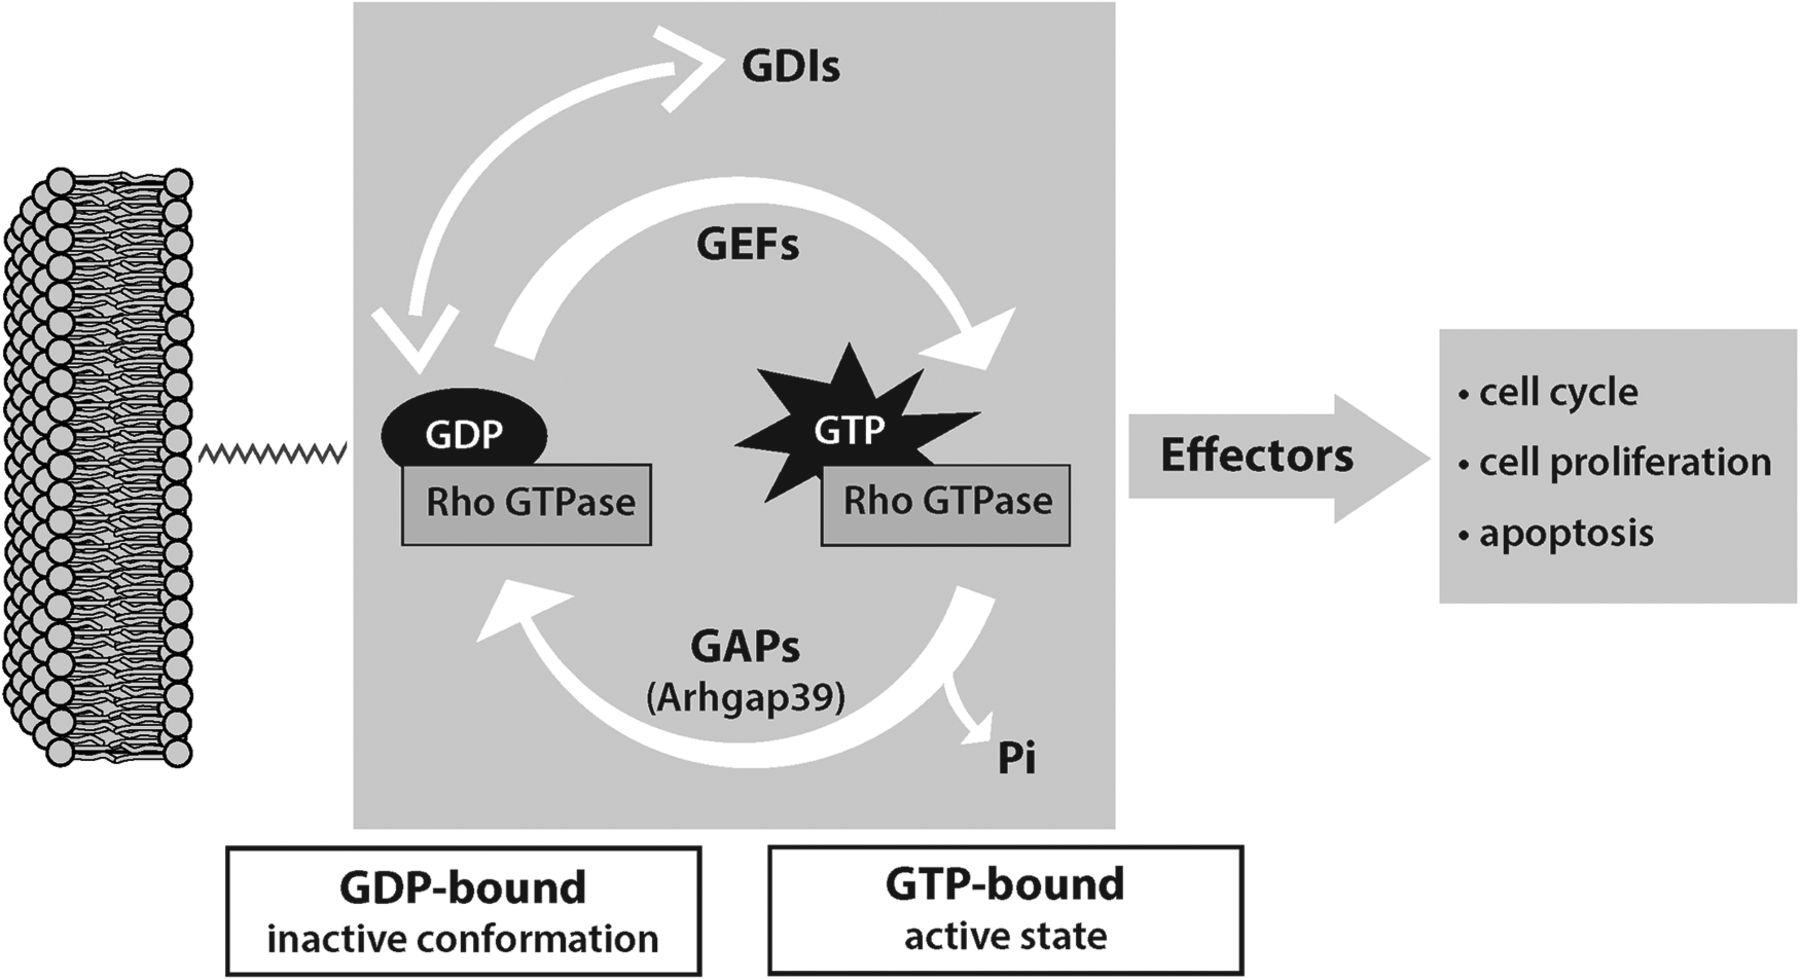 Porf-2 = Arhgap39 = Vilse: A Pivotal Role in